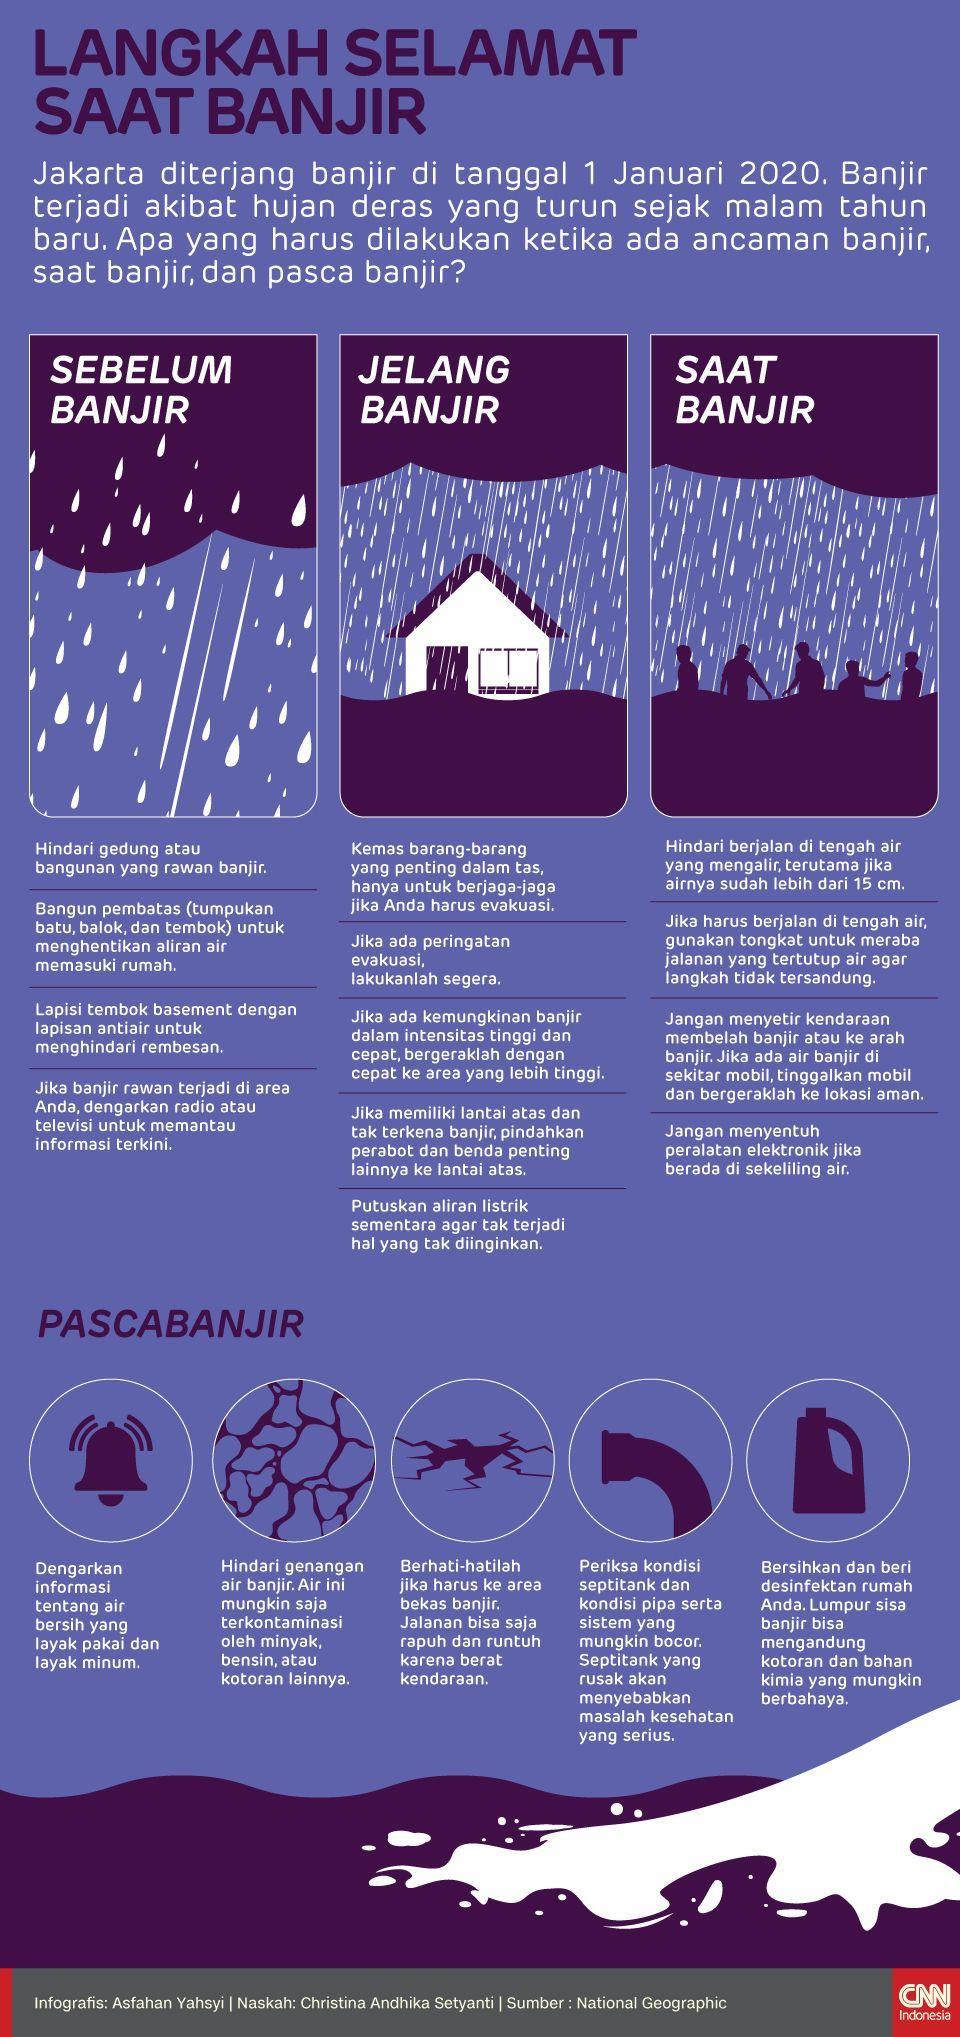 Infografis Langkah Selamat Saat Banjir